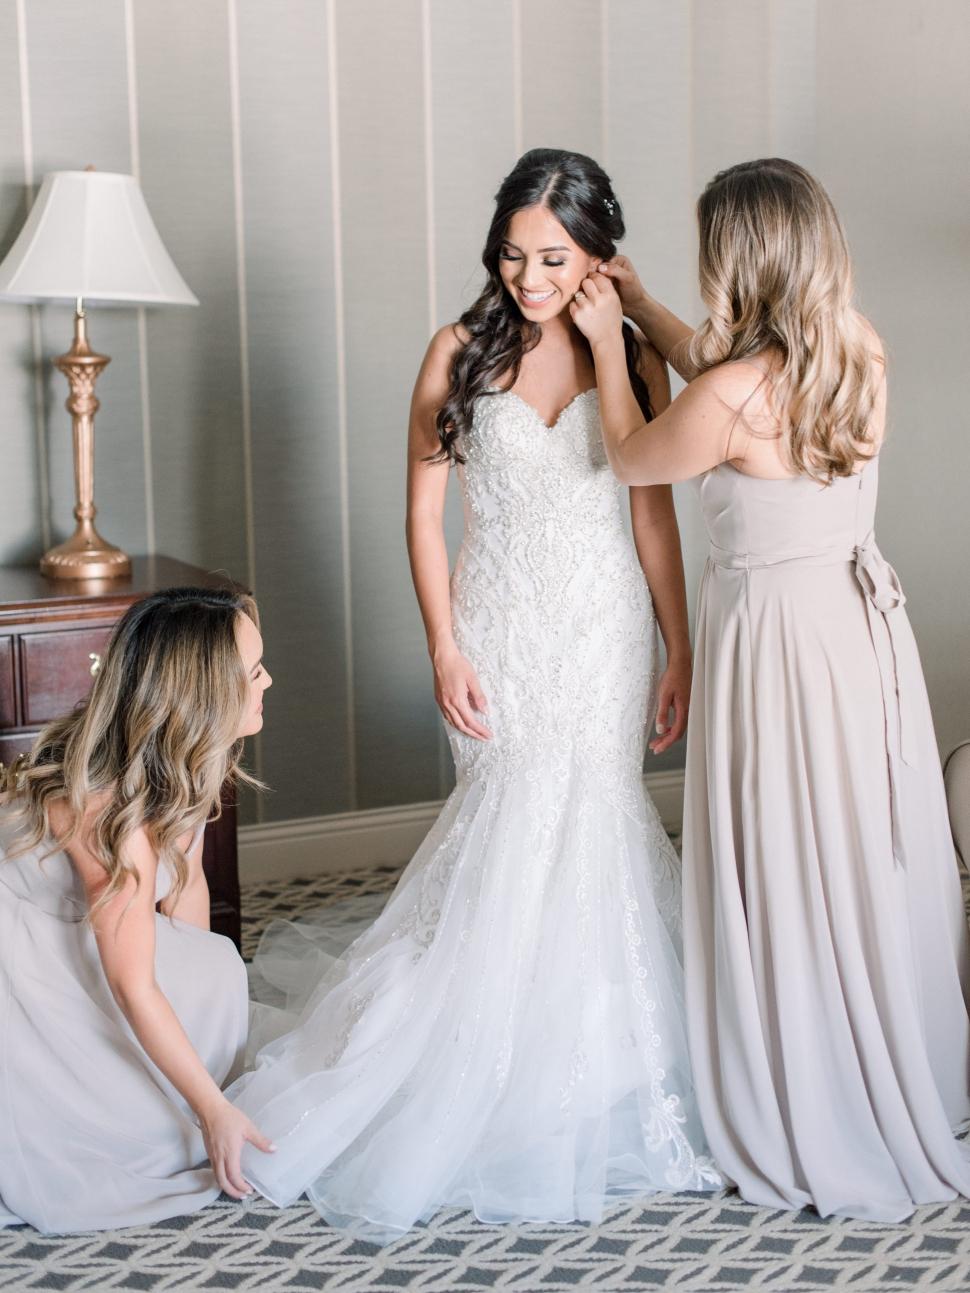 The-Madison-Hotel-Wedding-Photographer-Morristown-NJ-Photographer-Cassi-Claire_04.jpg